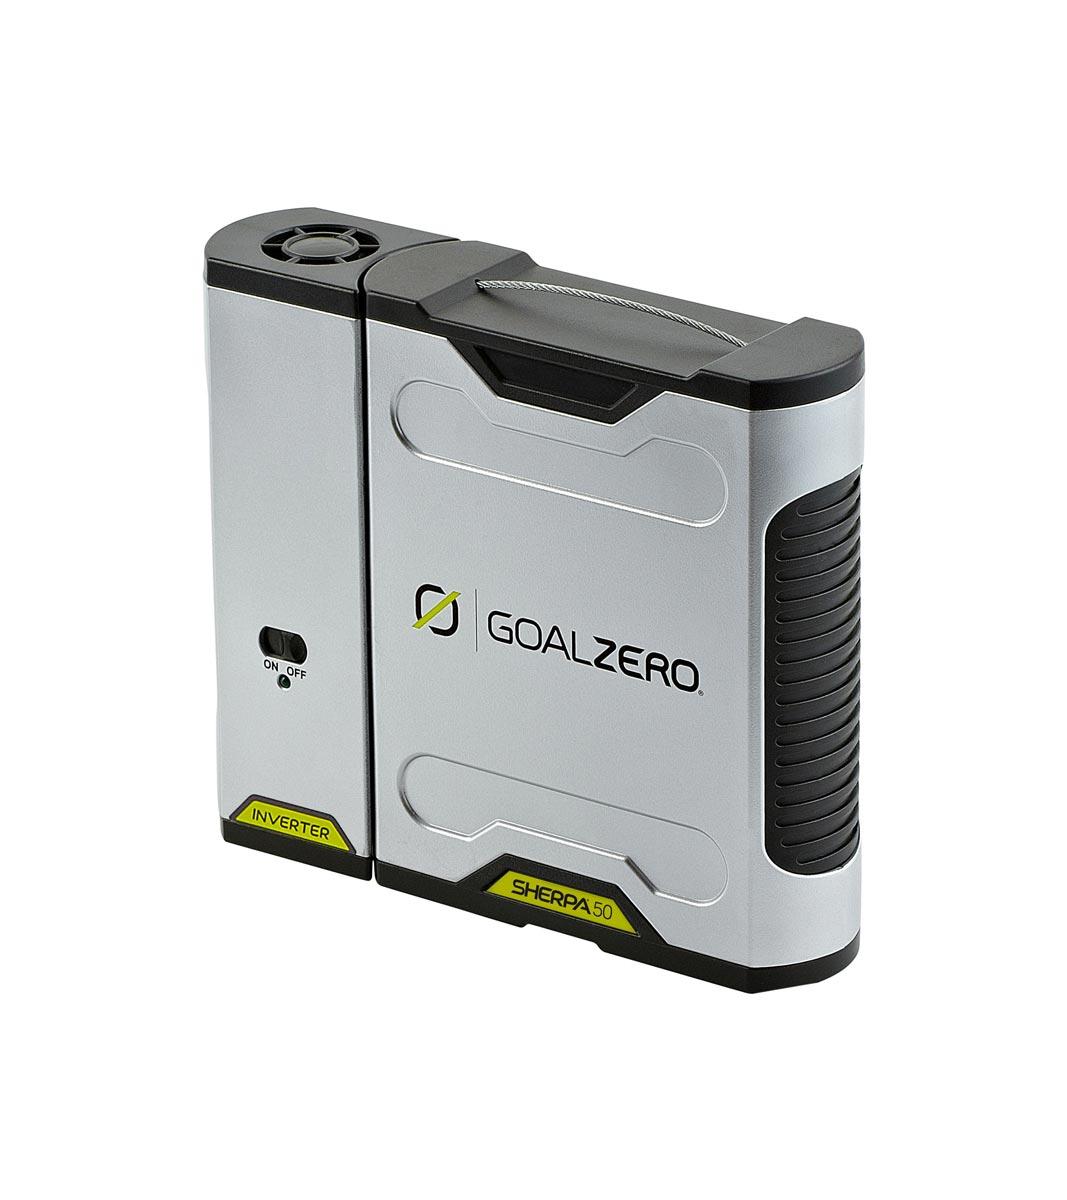 goal zero sherpa 50 recharger apollo satcom. Black Bedroom Furniture Sets. Home Design Ideas